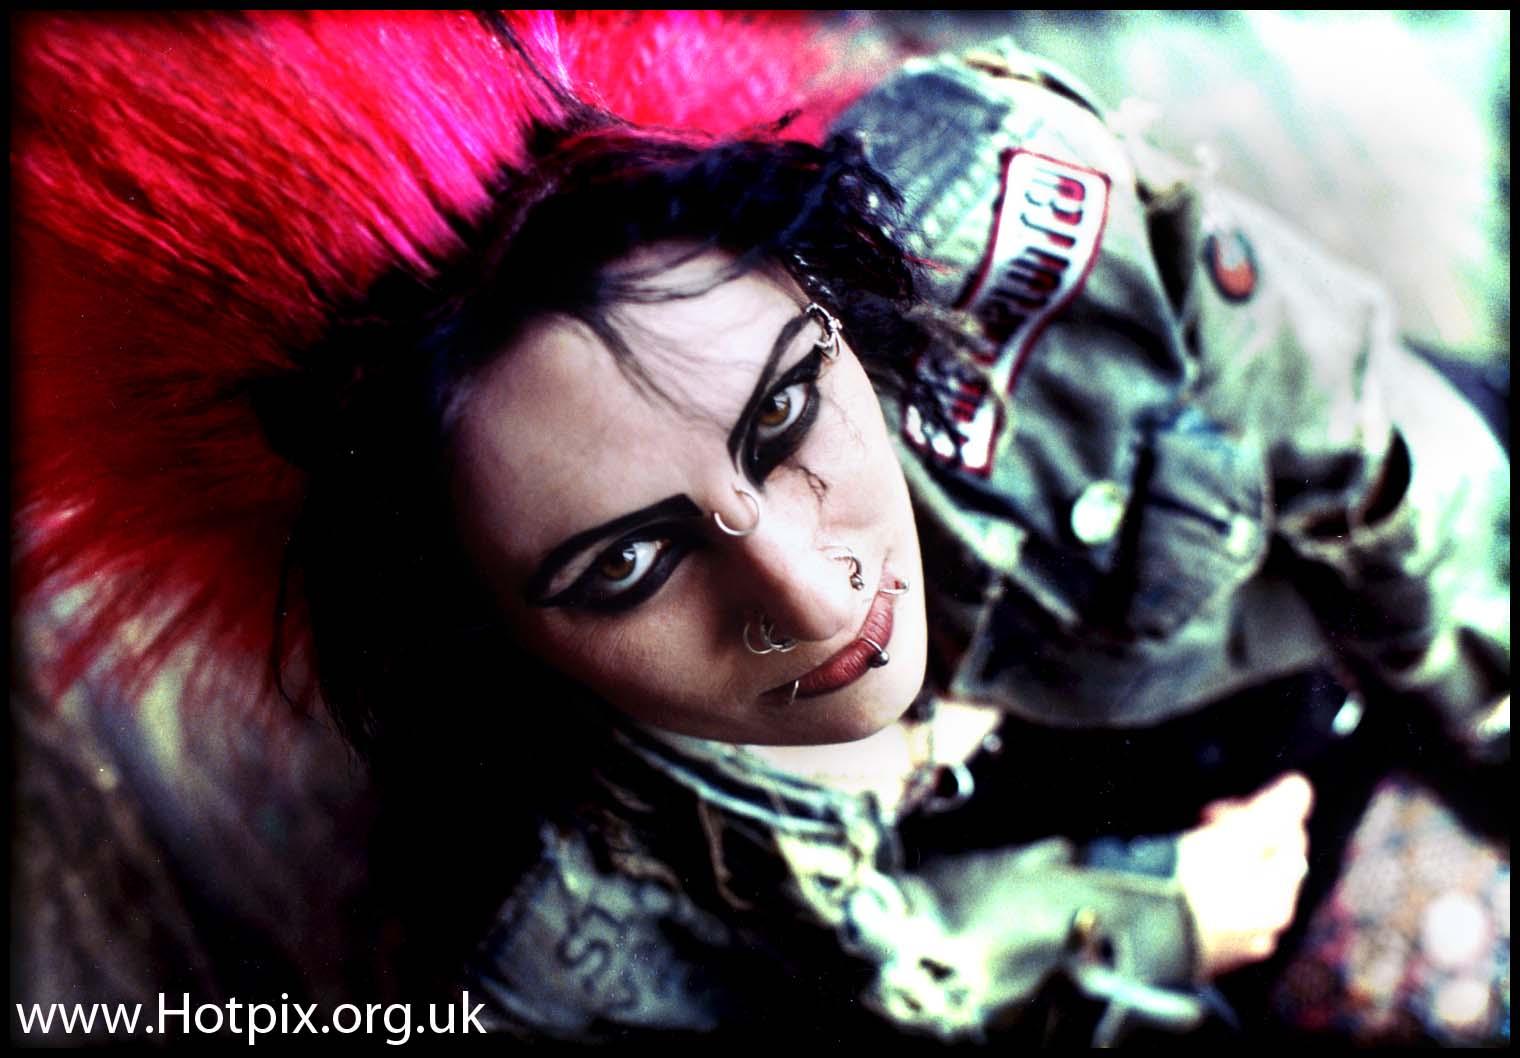 punk,girl,queen,tony,mohawk,hair,smith,spike,tonysmith,spiky,pierced,piercing,lip,stud,studs,hotpix,hotpics,hot,pix,pics,exploited,uk,england,stockport,europe,red,hairstyle,lips,sexy,cute,tights,tight,stocking,hotpix.com,#tonysmithhotpix,#tonysmithotpix,MIS,@hotpixUK,ActiveH,housingtechnology